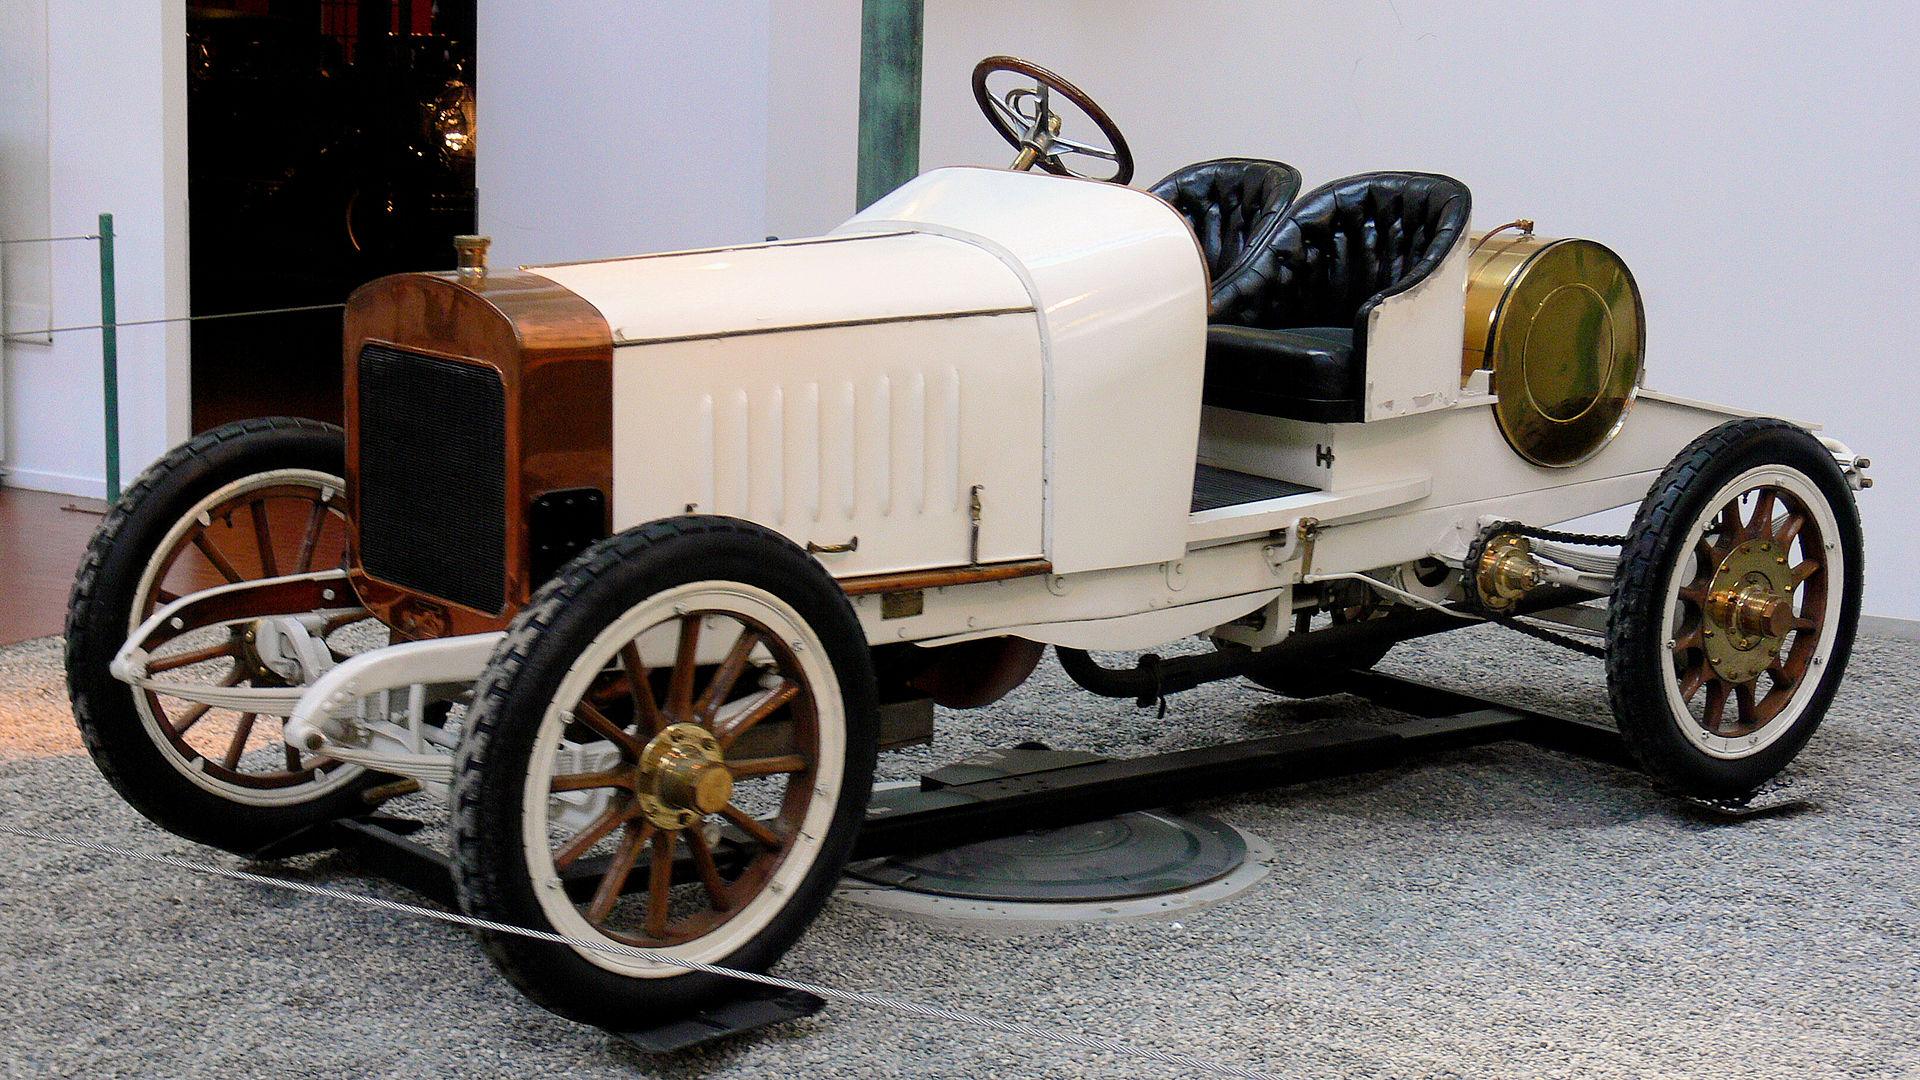 Mathis_Hermes-ontworpen-door-Ettore-Bugatti